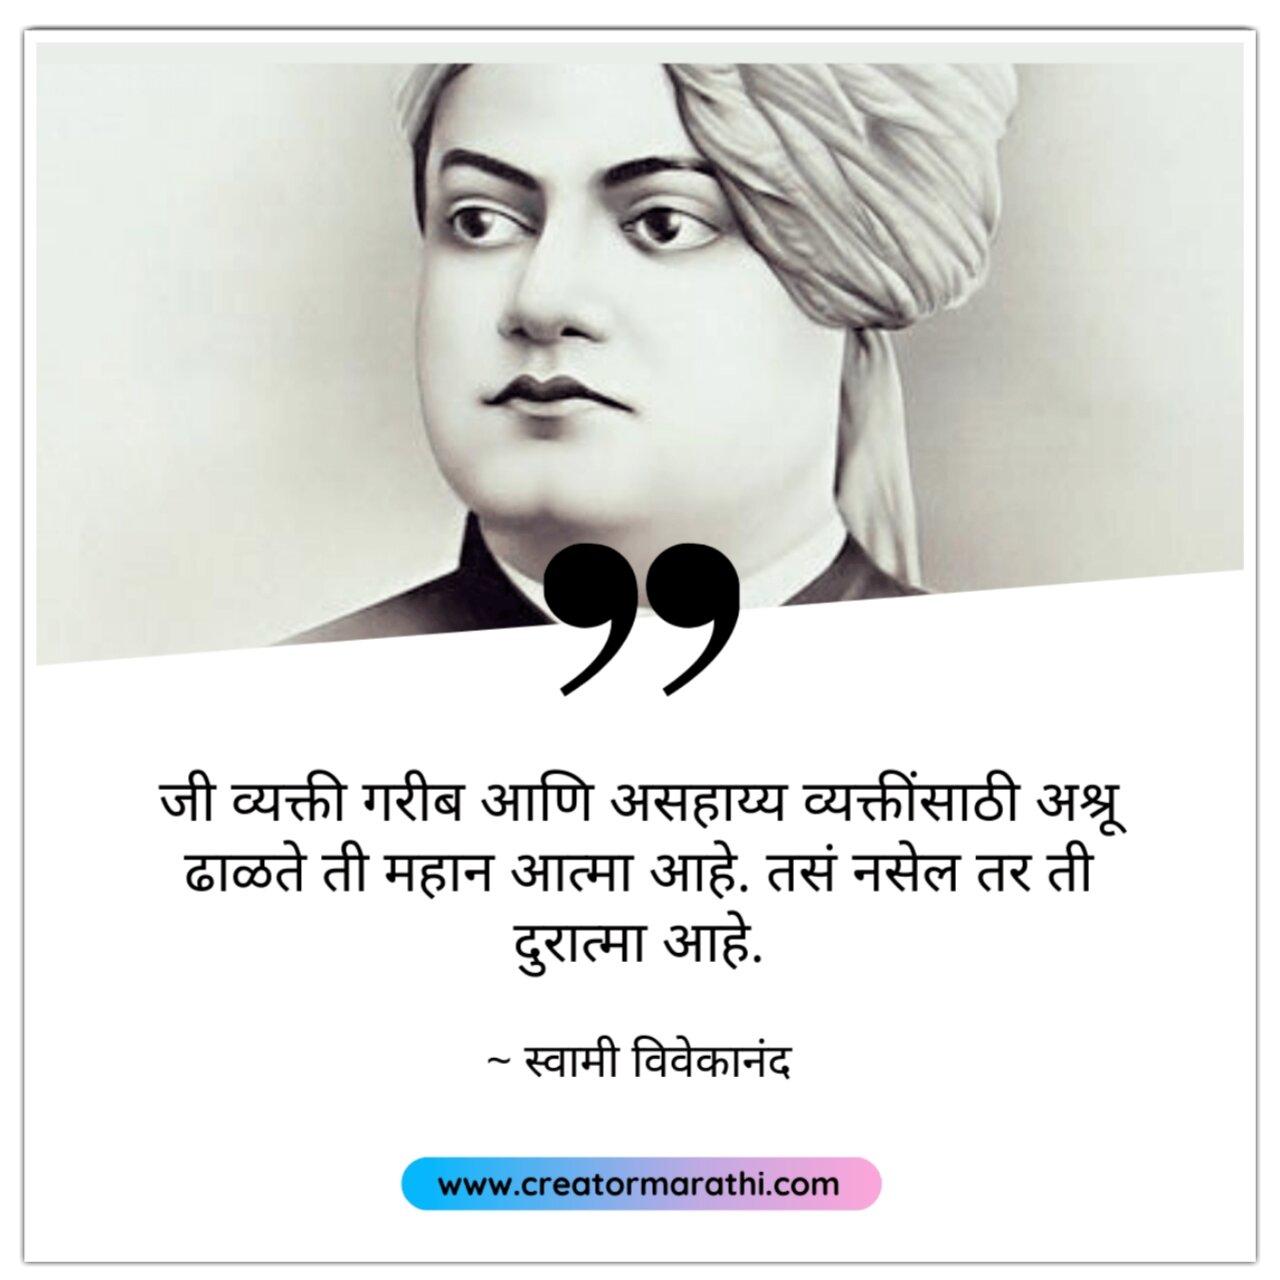 Swami Vivekananda Inspirational quotes In Marathi